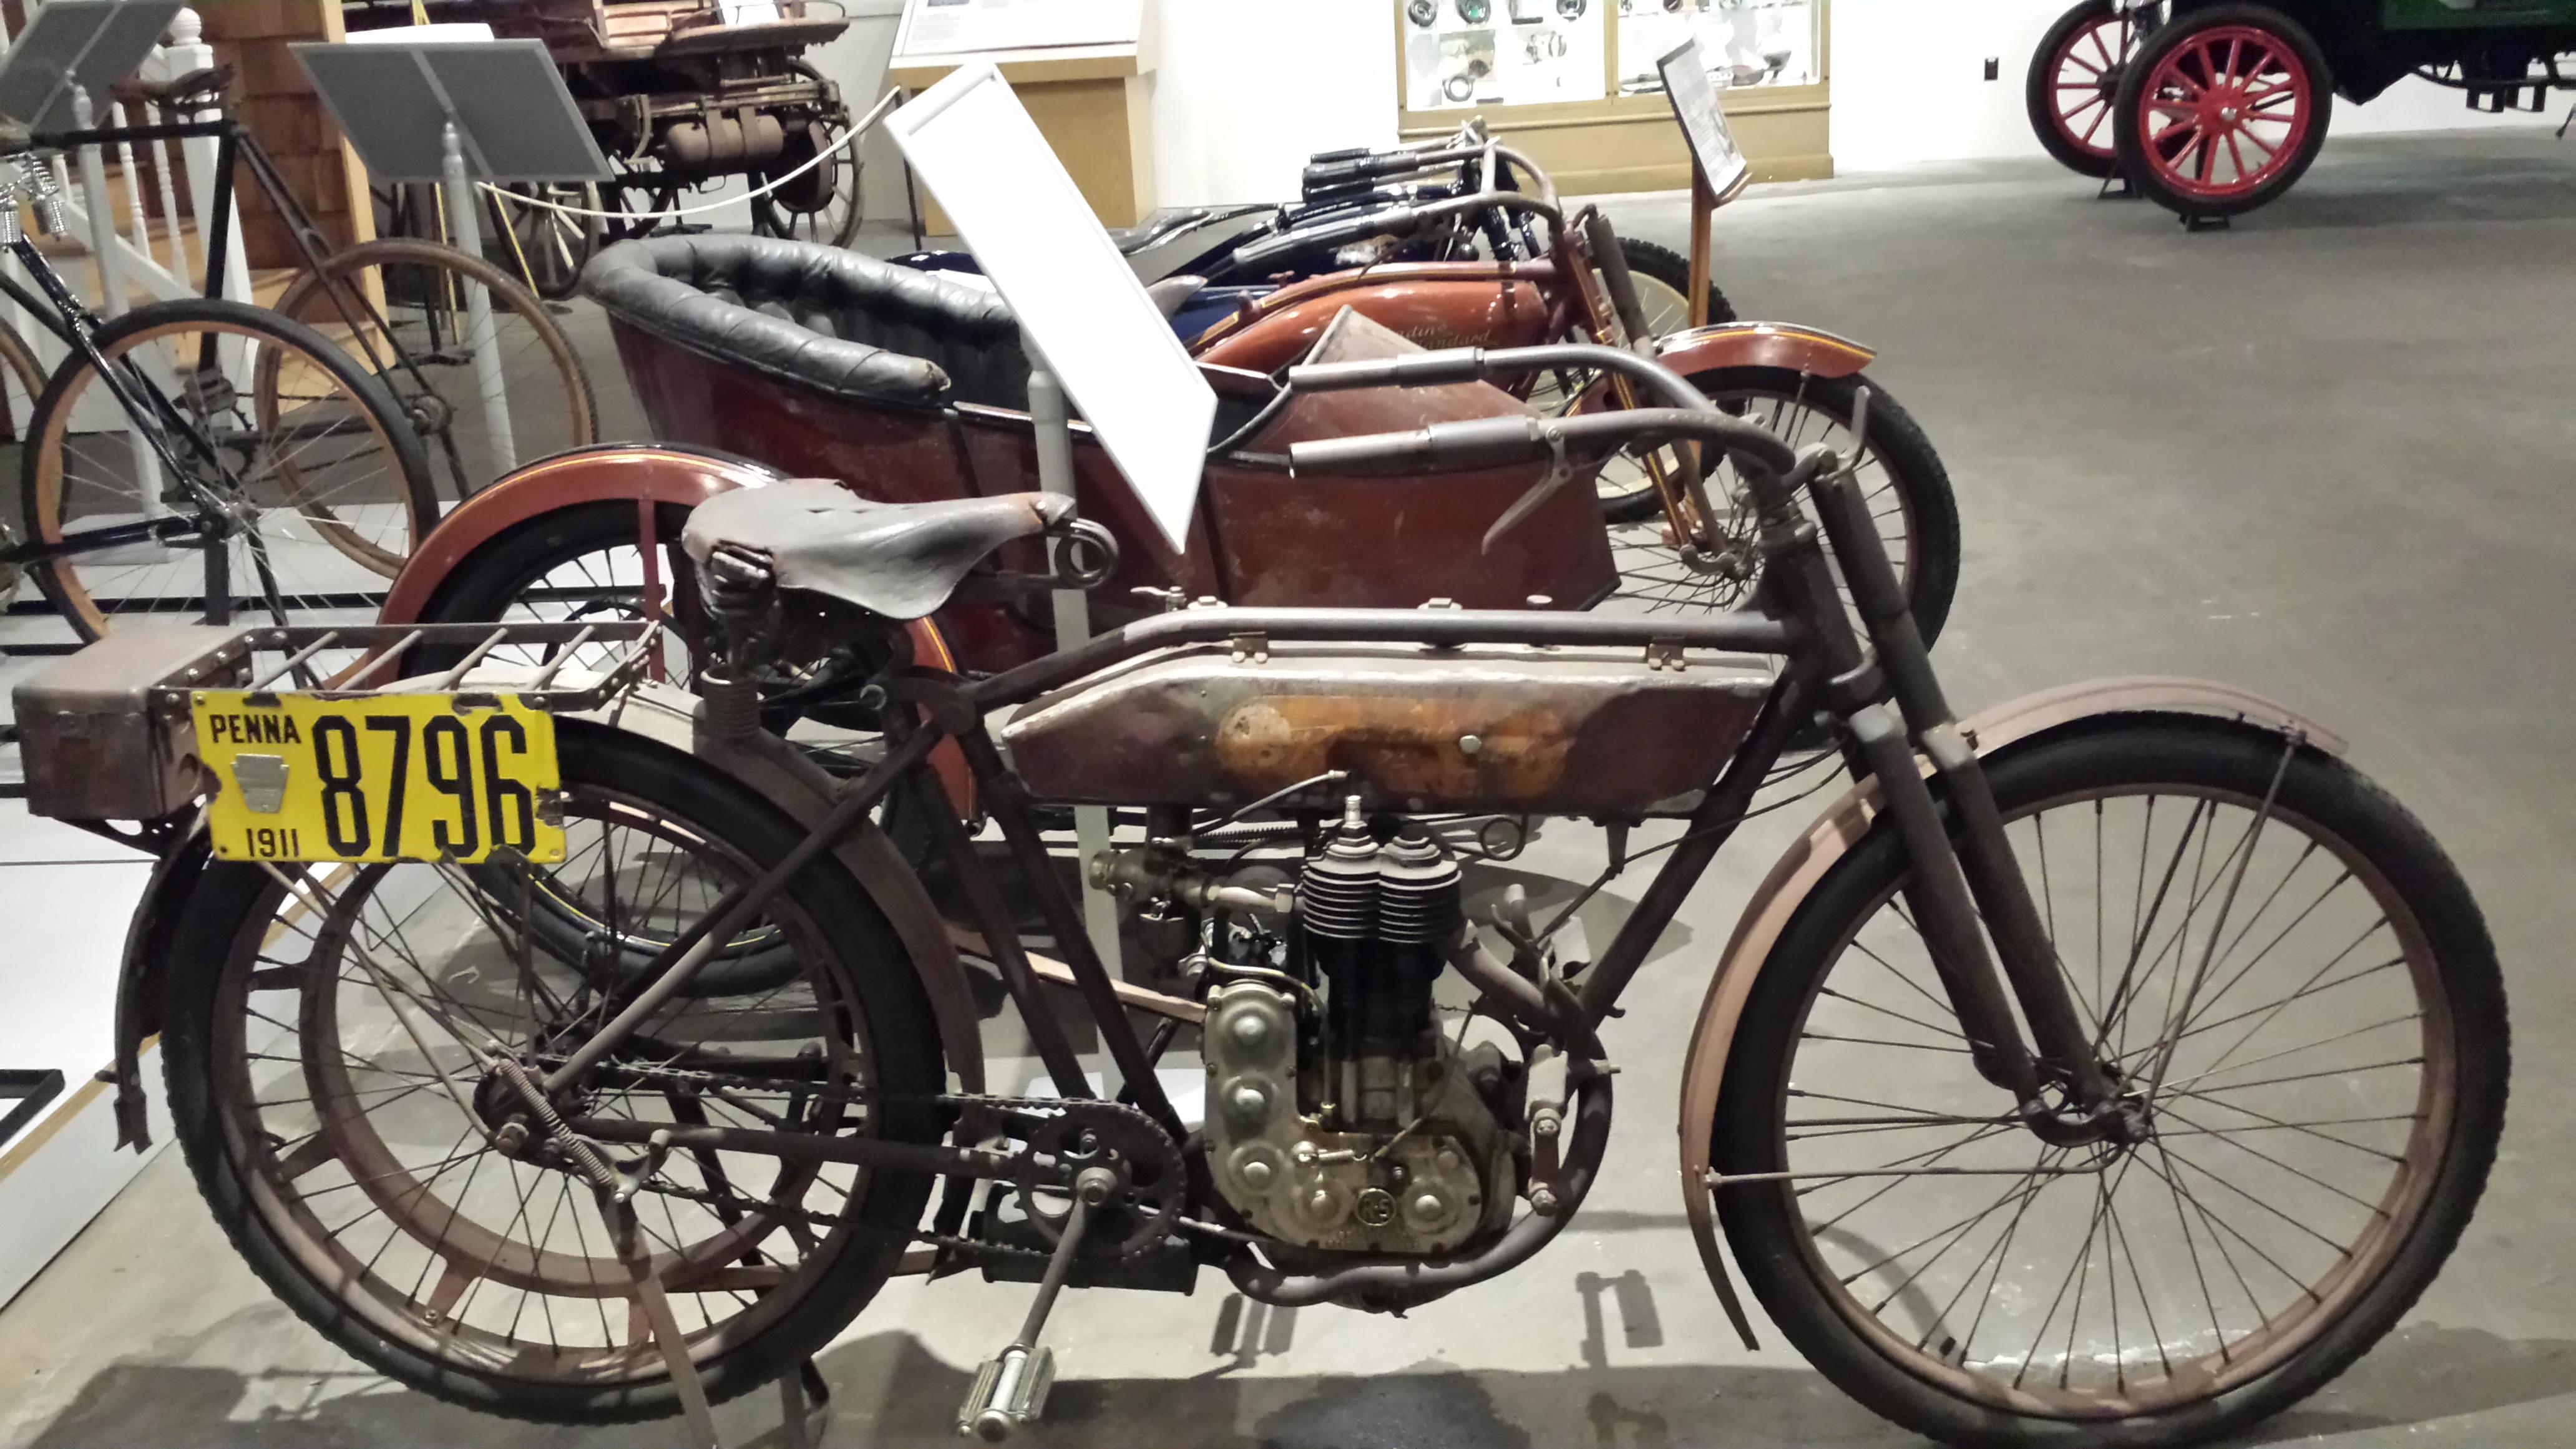 Boyertown Auto Museum | antique motorcycle |boyertown pa